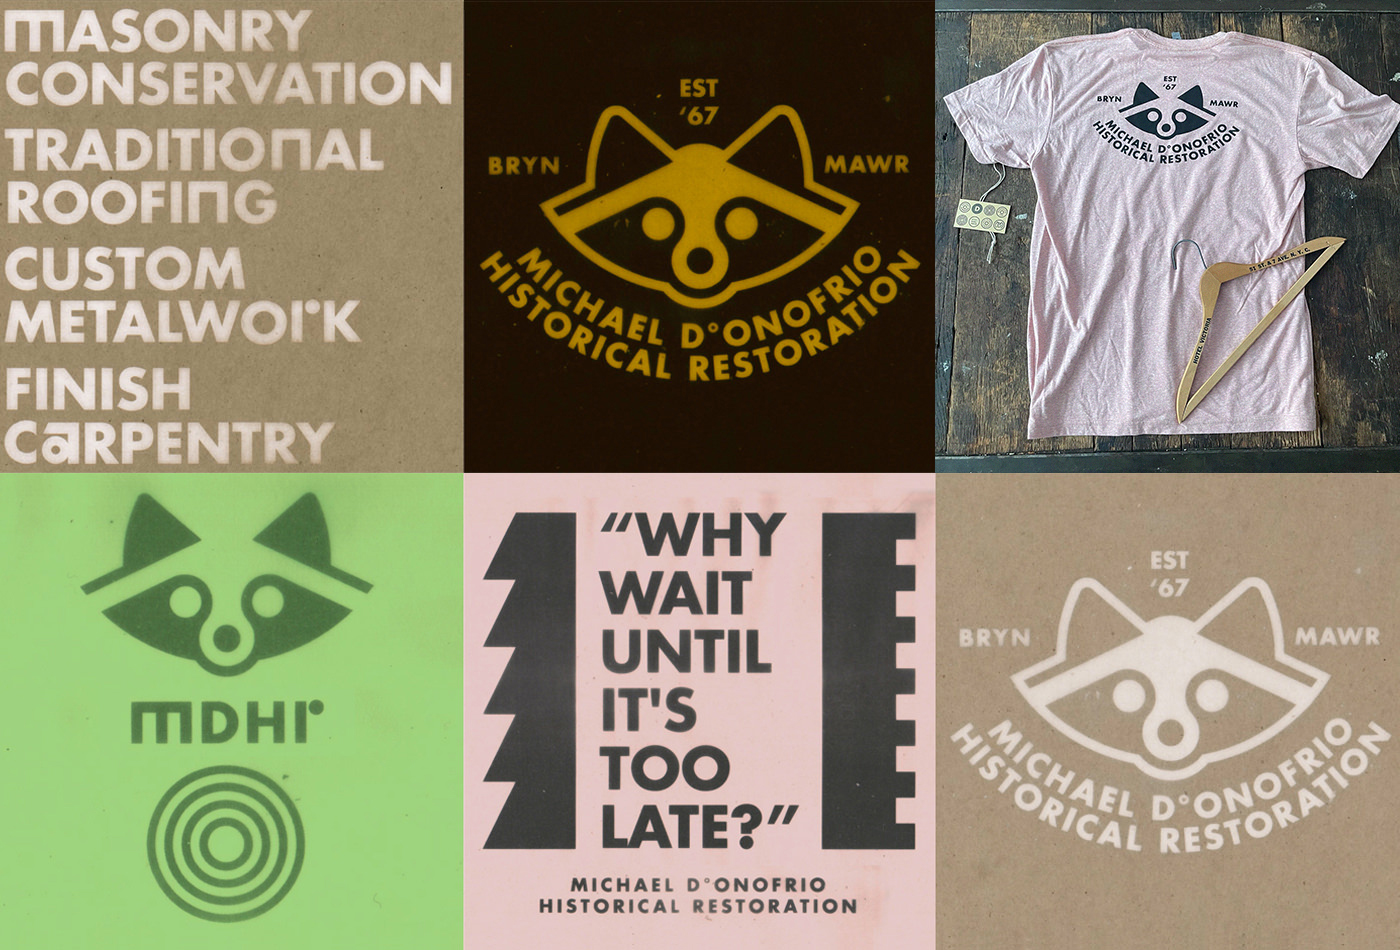 mdhr-historical-restoration-donofrio-michaeldonofrio-vacaliebres-markdonofrio-philly-mainline-tshirt-tees-azban-mascot